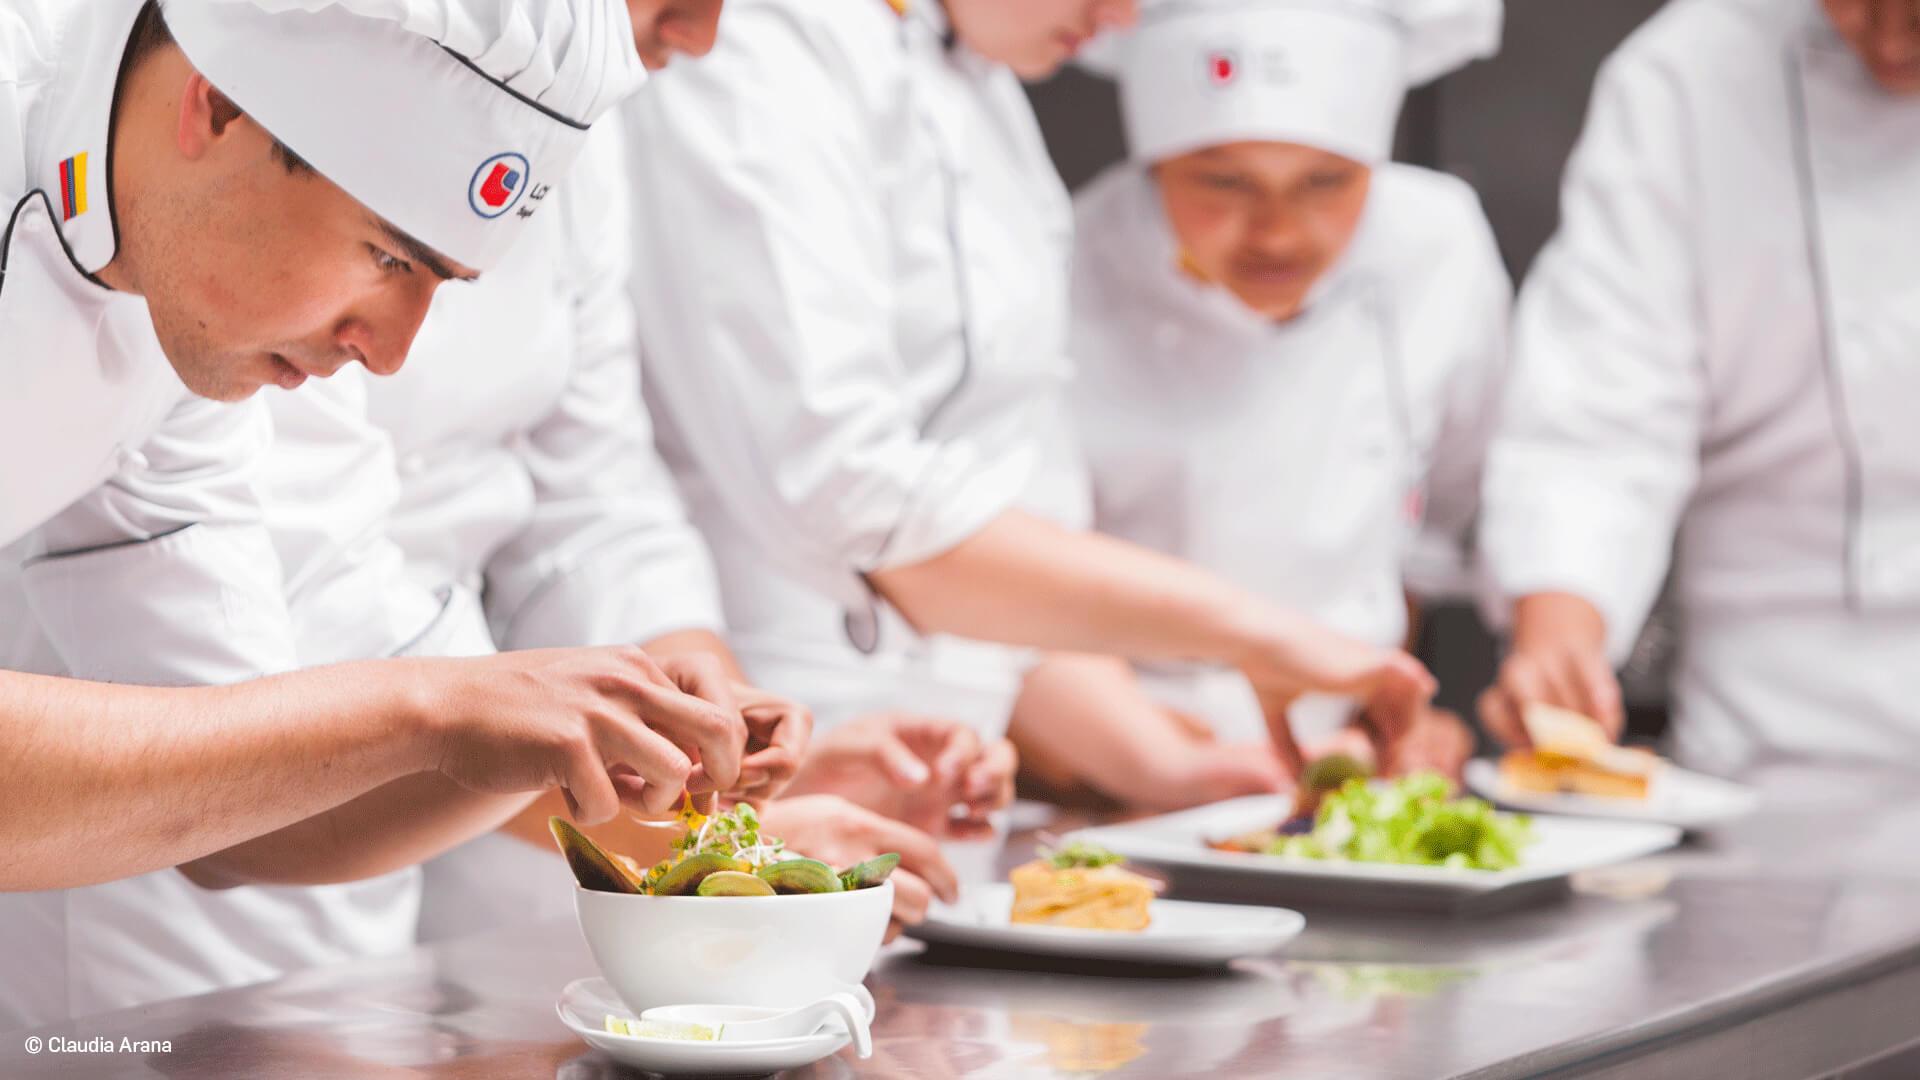 Gastronomia quieres estudiar for Donde estudiar cocina